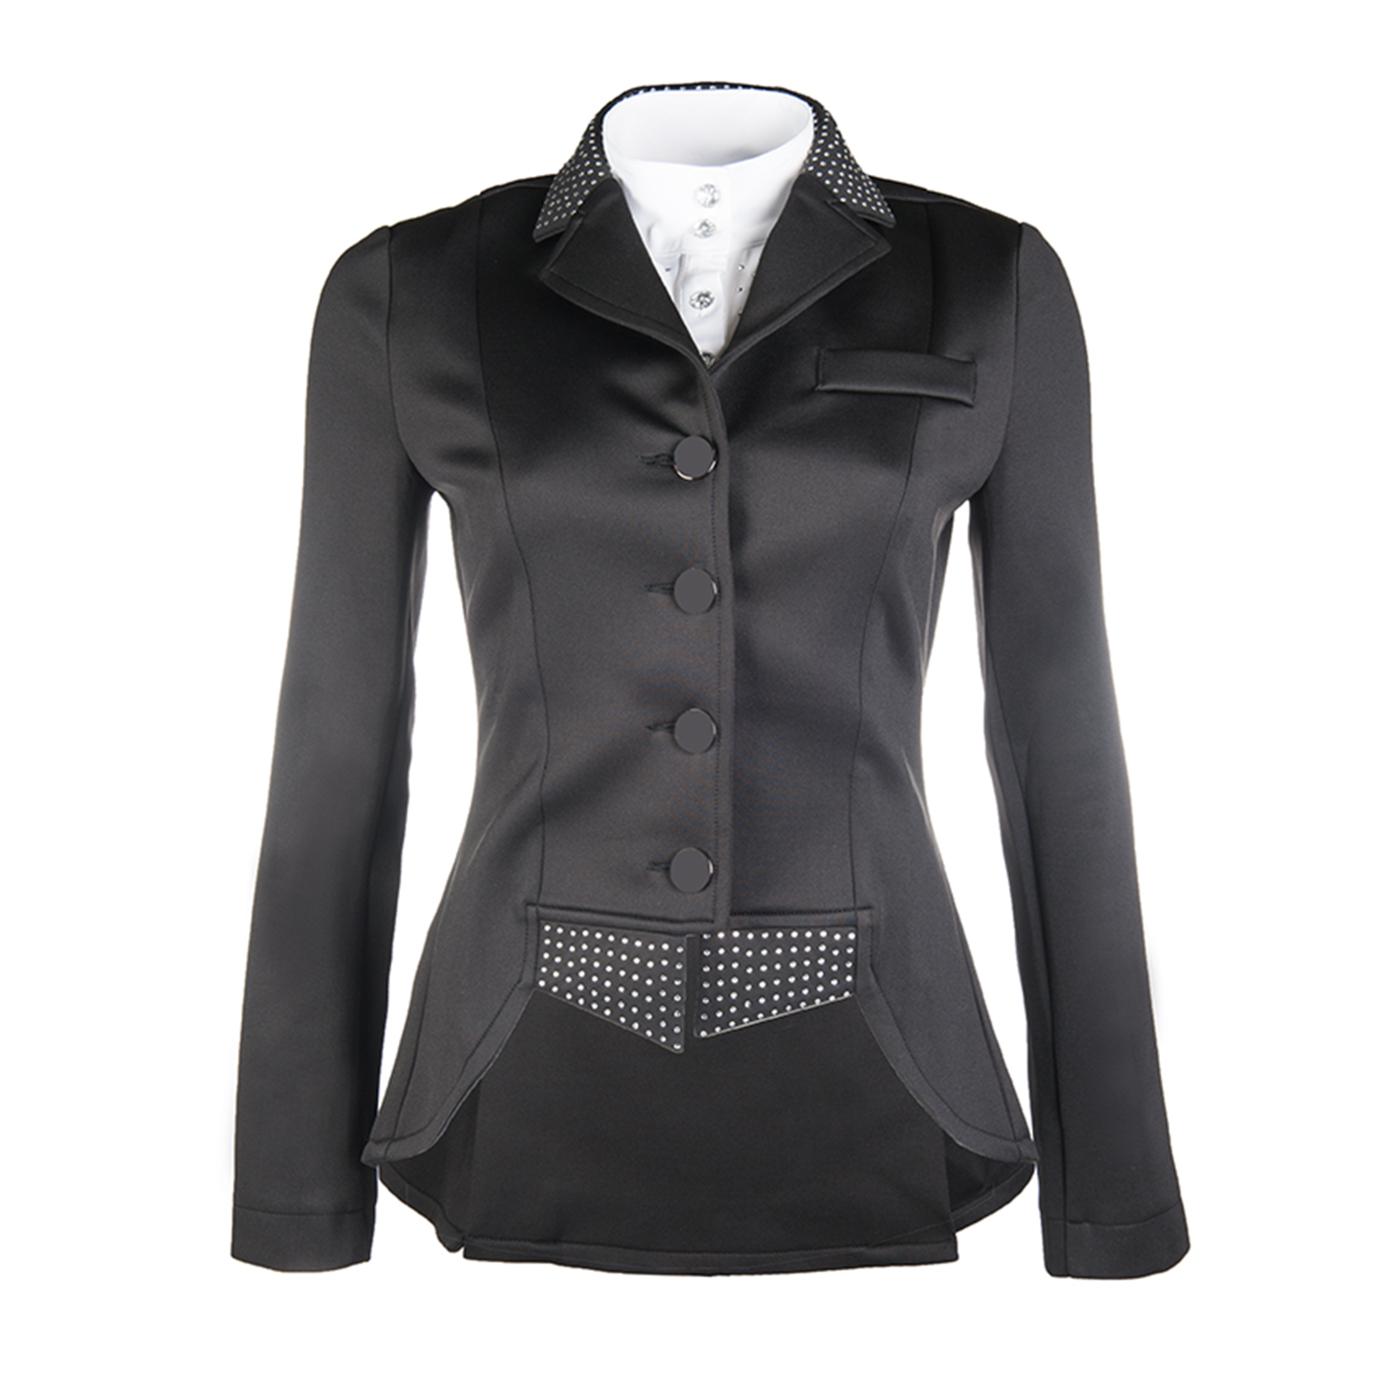 CM Cavallino Marino Venezia Competition Jacket